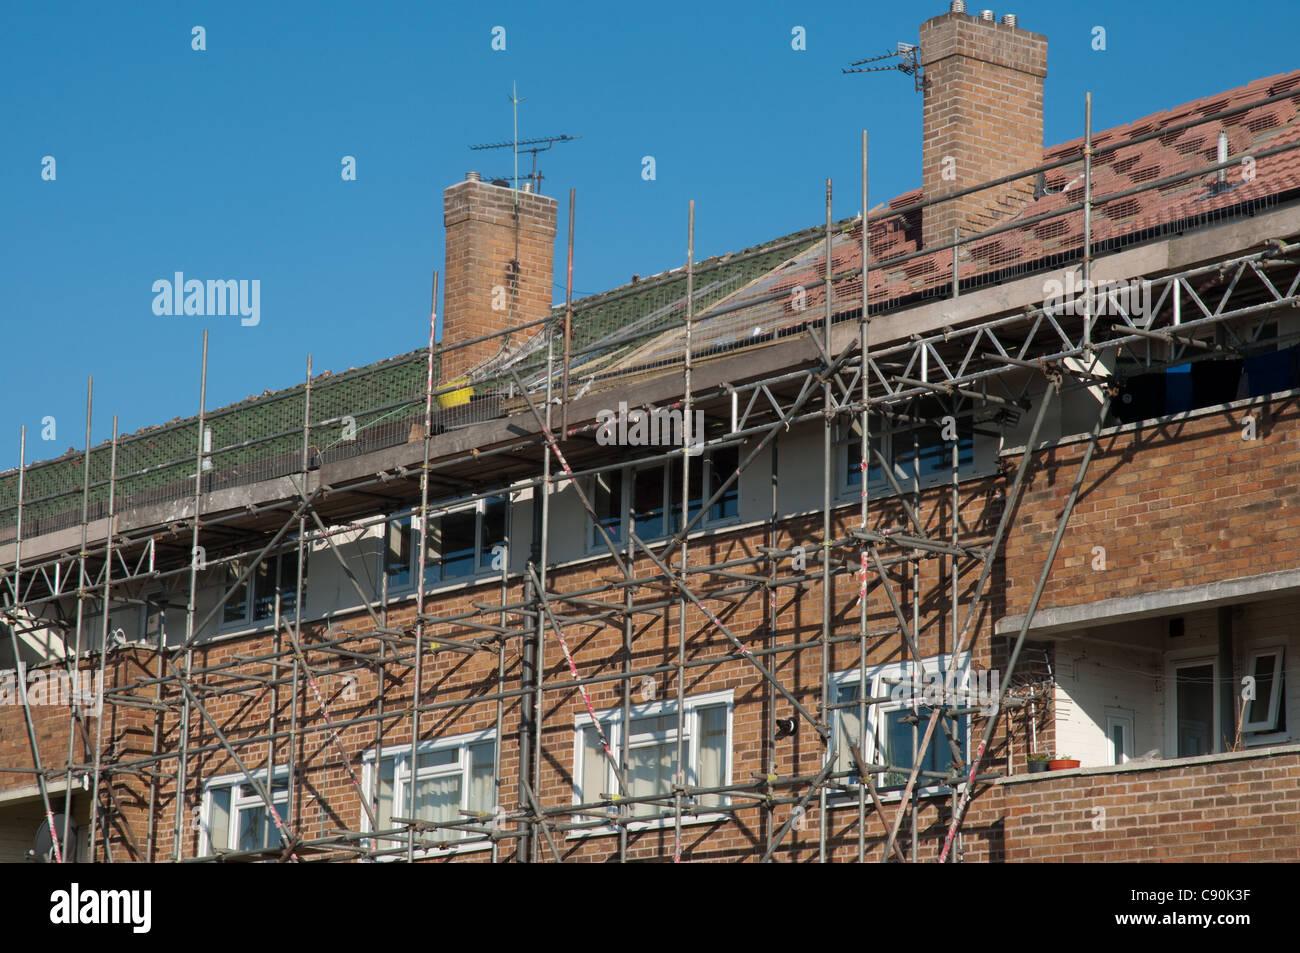 Social housing scheme undergoing refurbishment. Wythenshawe, Manchester. - Stock Image